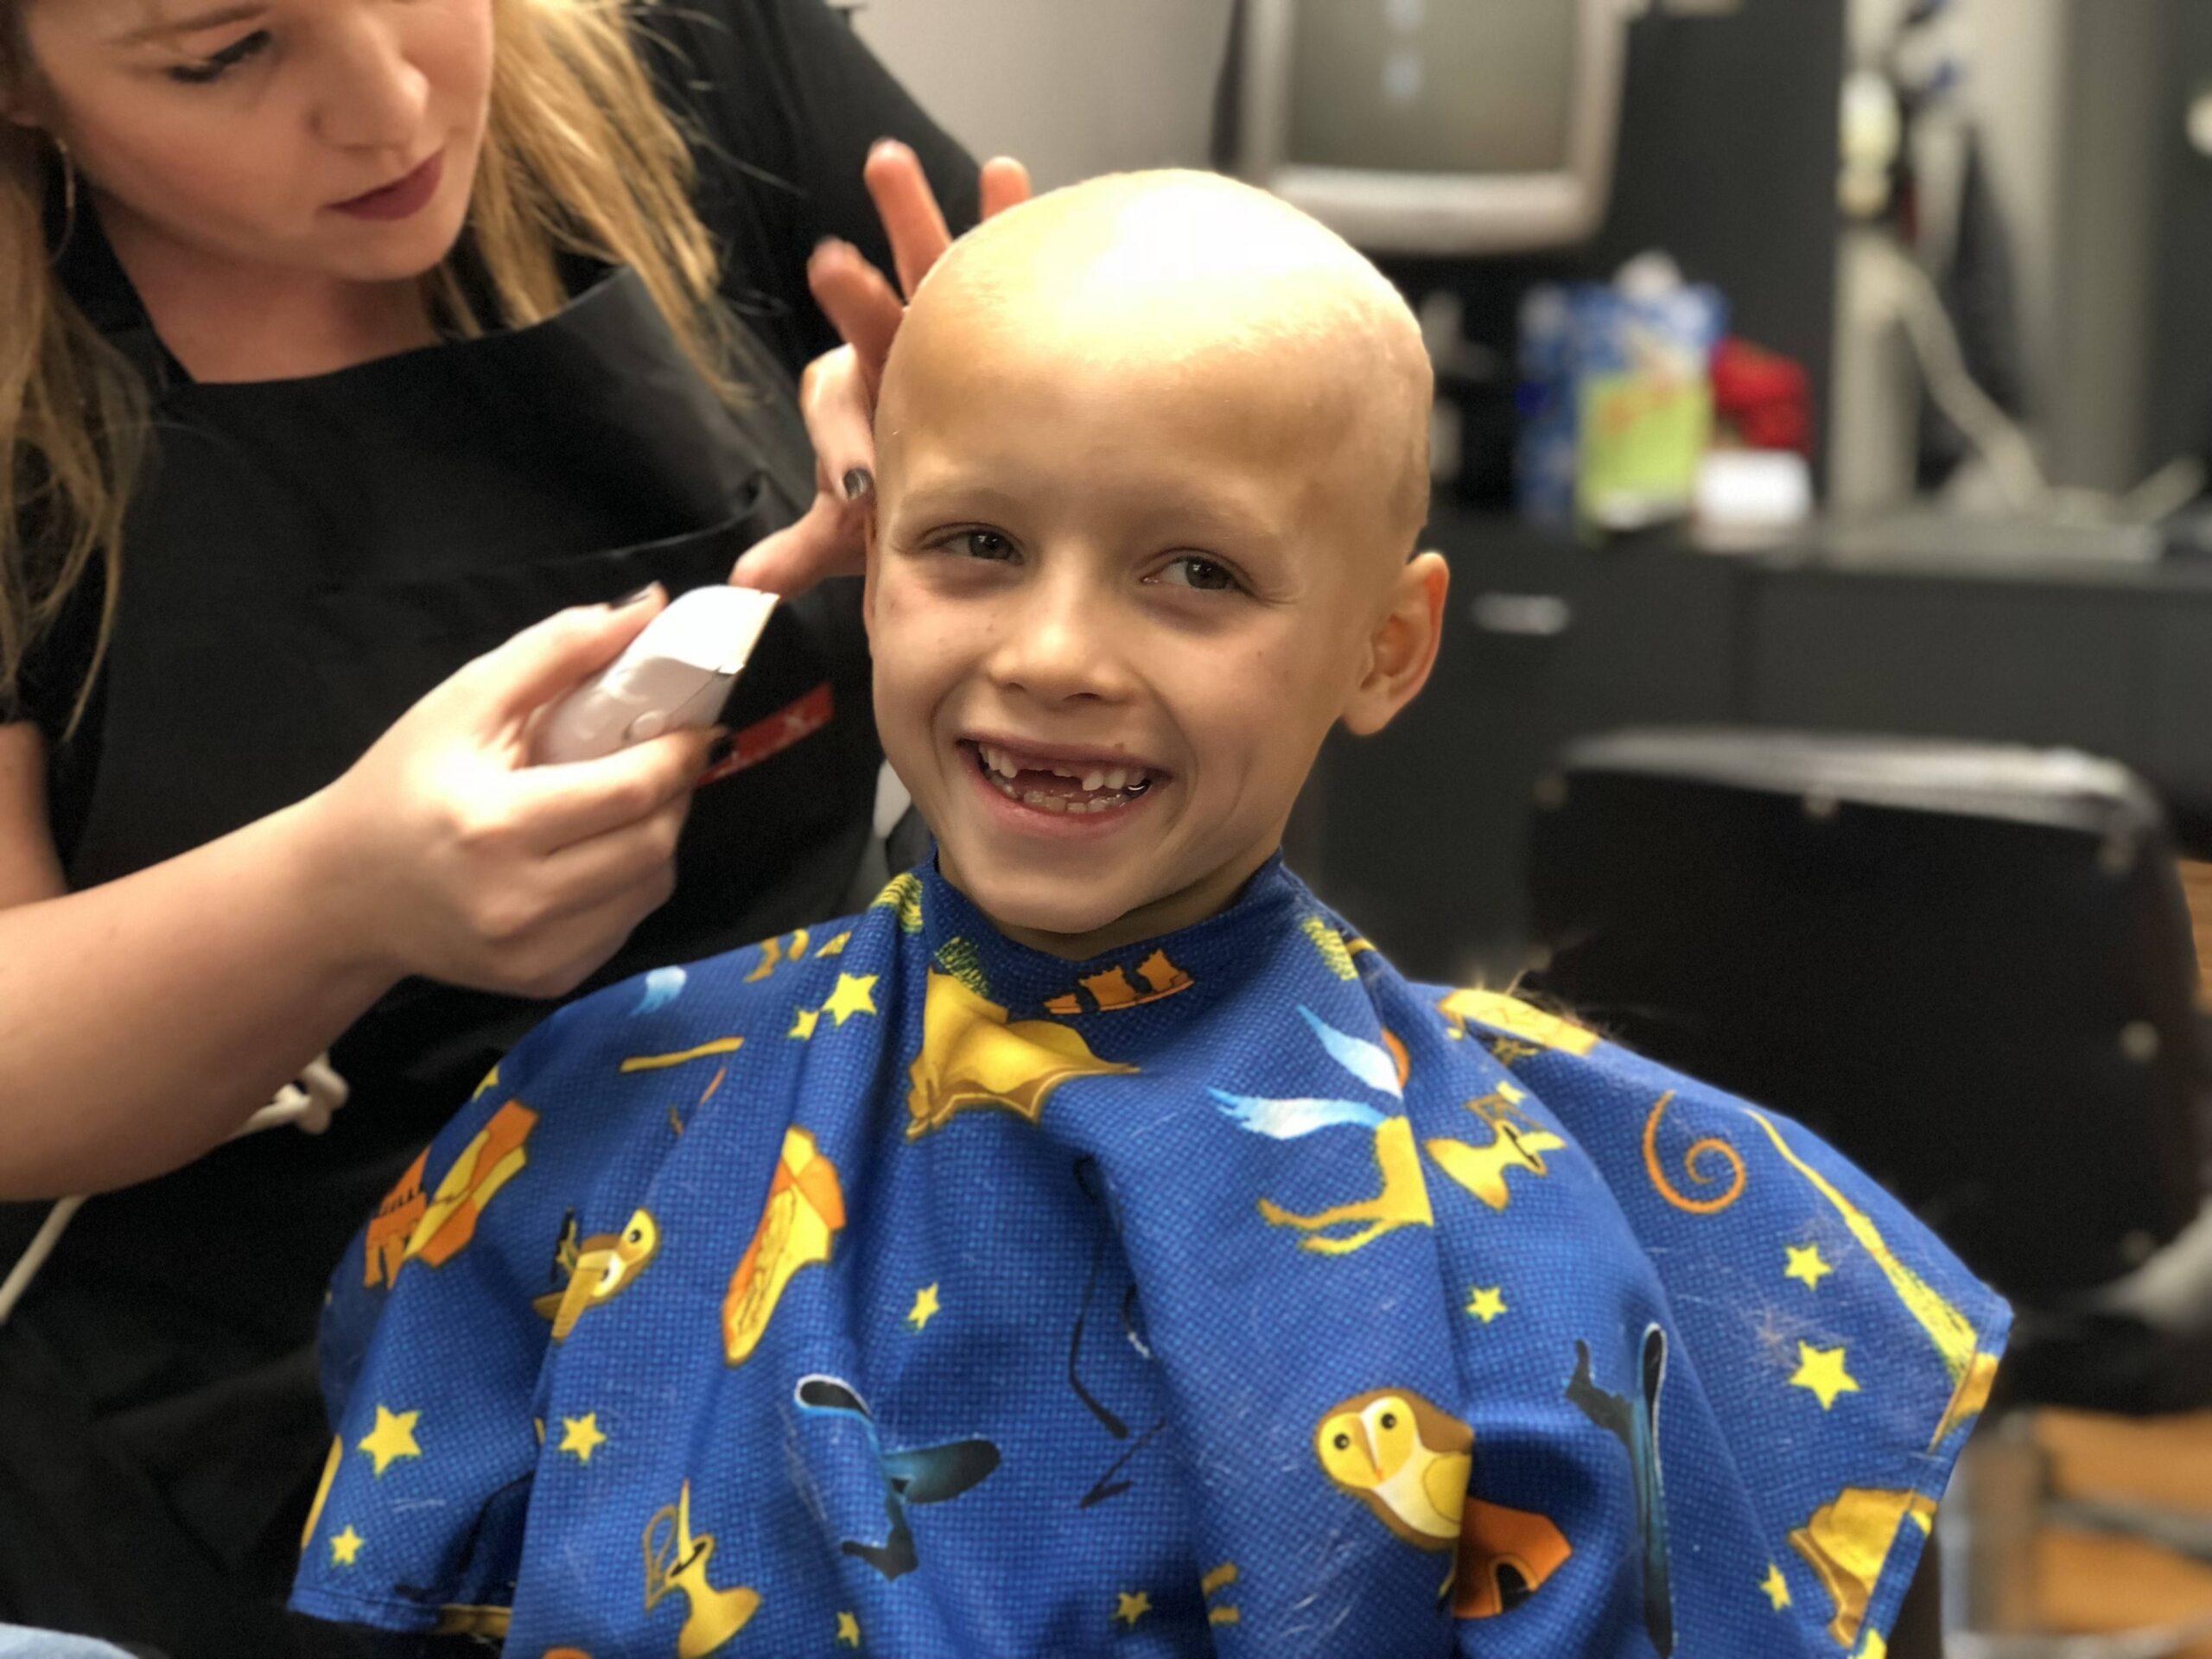 alopecia areata bald